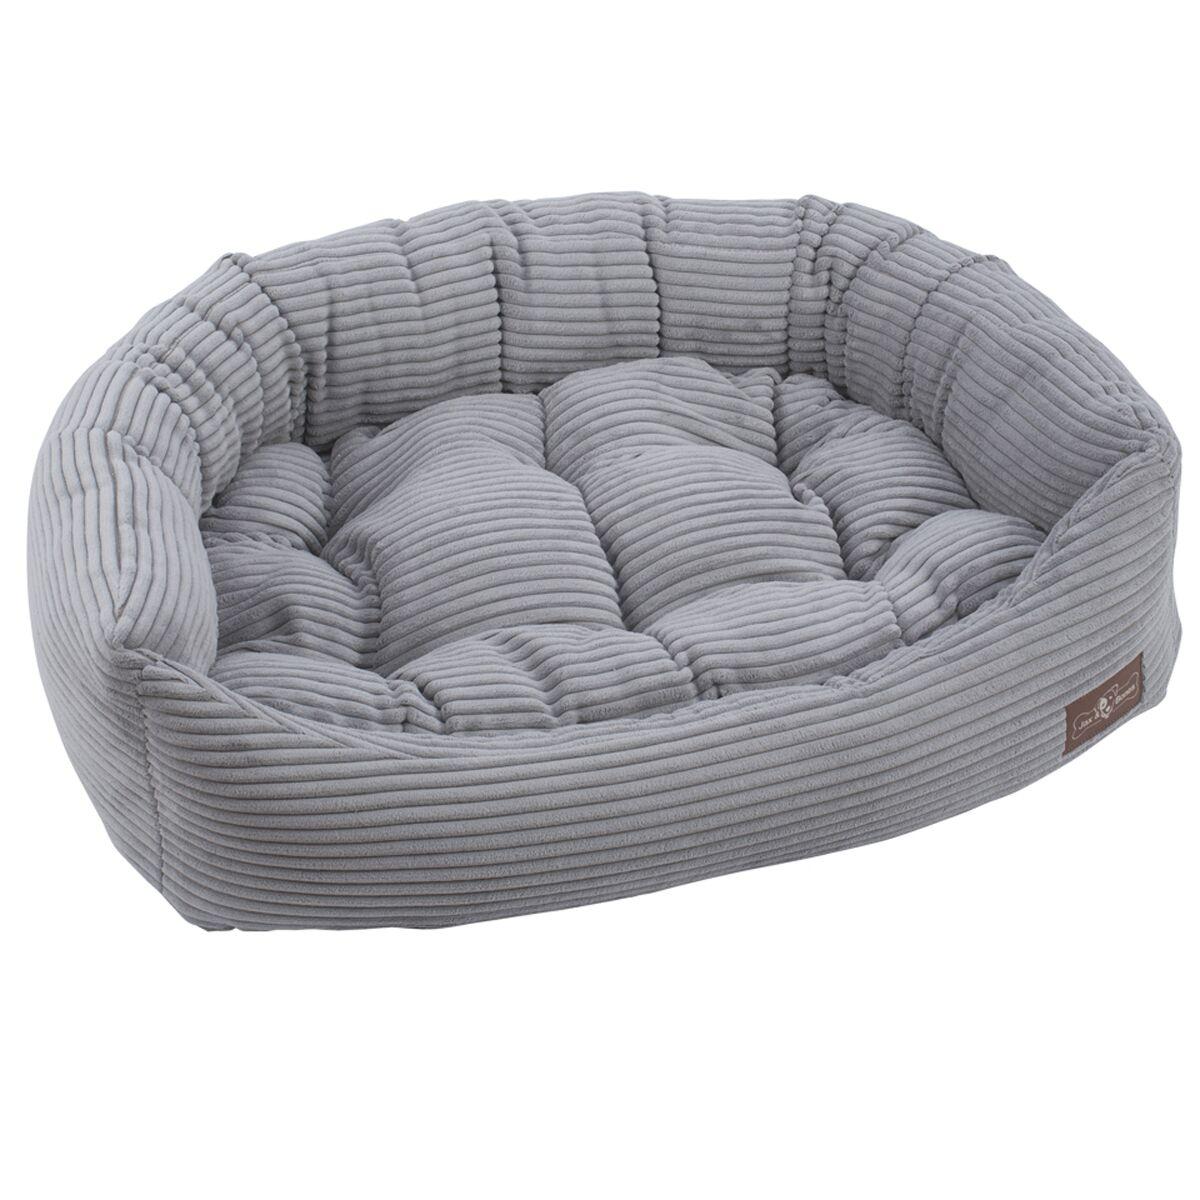 Corduroy Napper Bed Bolster Color: Dove Grey, Size: Medium - 27